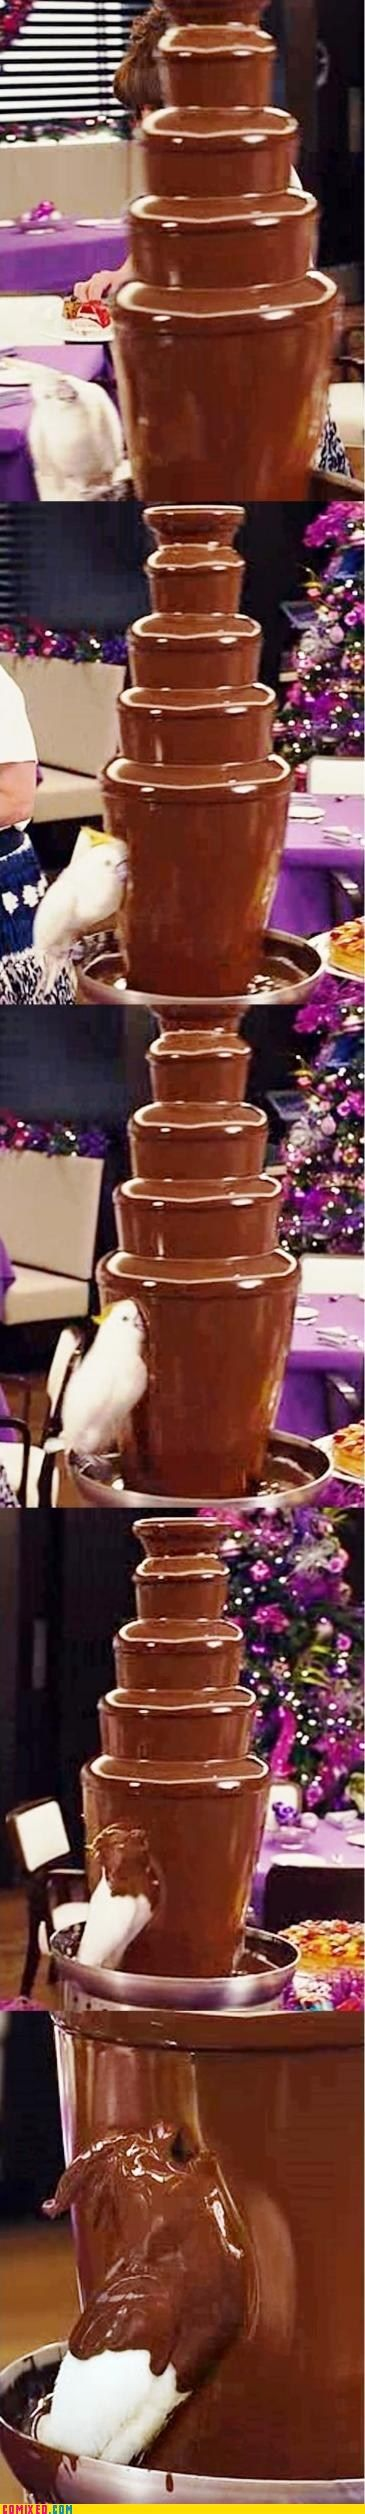 .: Chocolate Fountains, Chocolates, Chocolate Covered, Funny, Birds, Animal